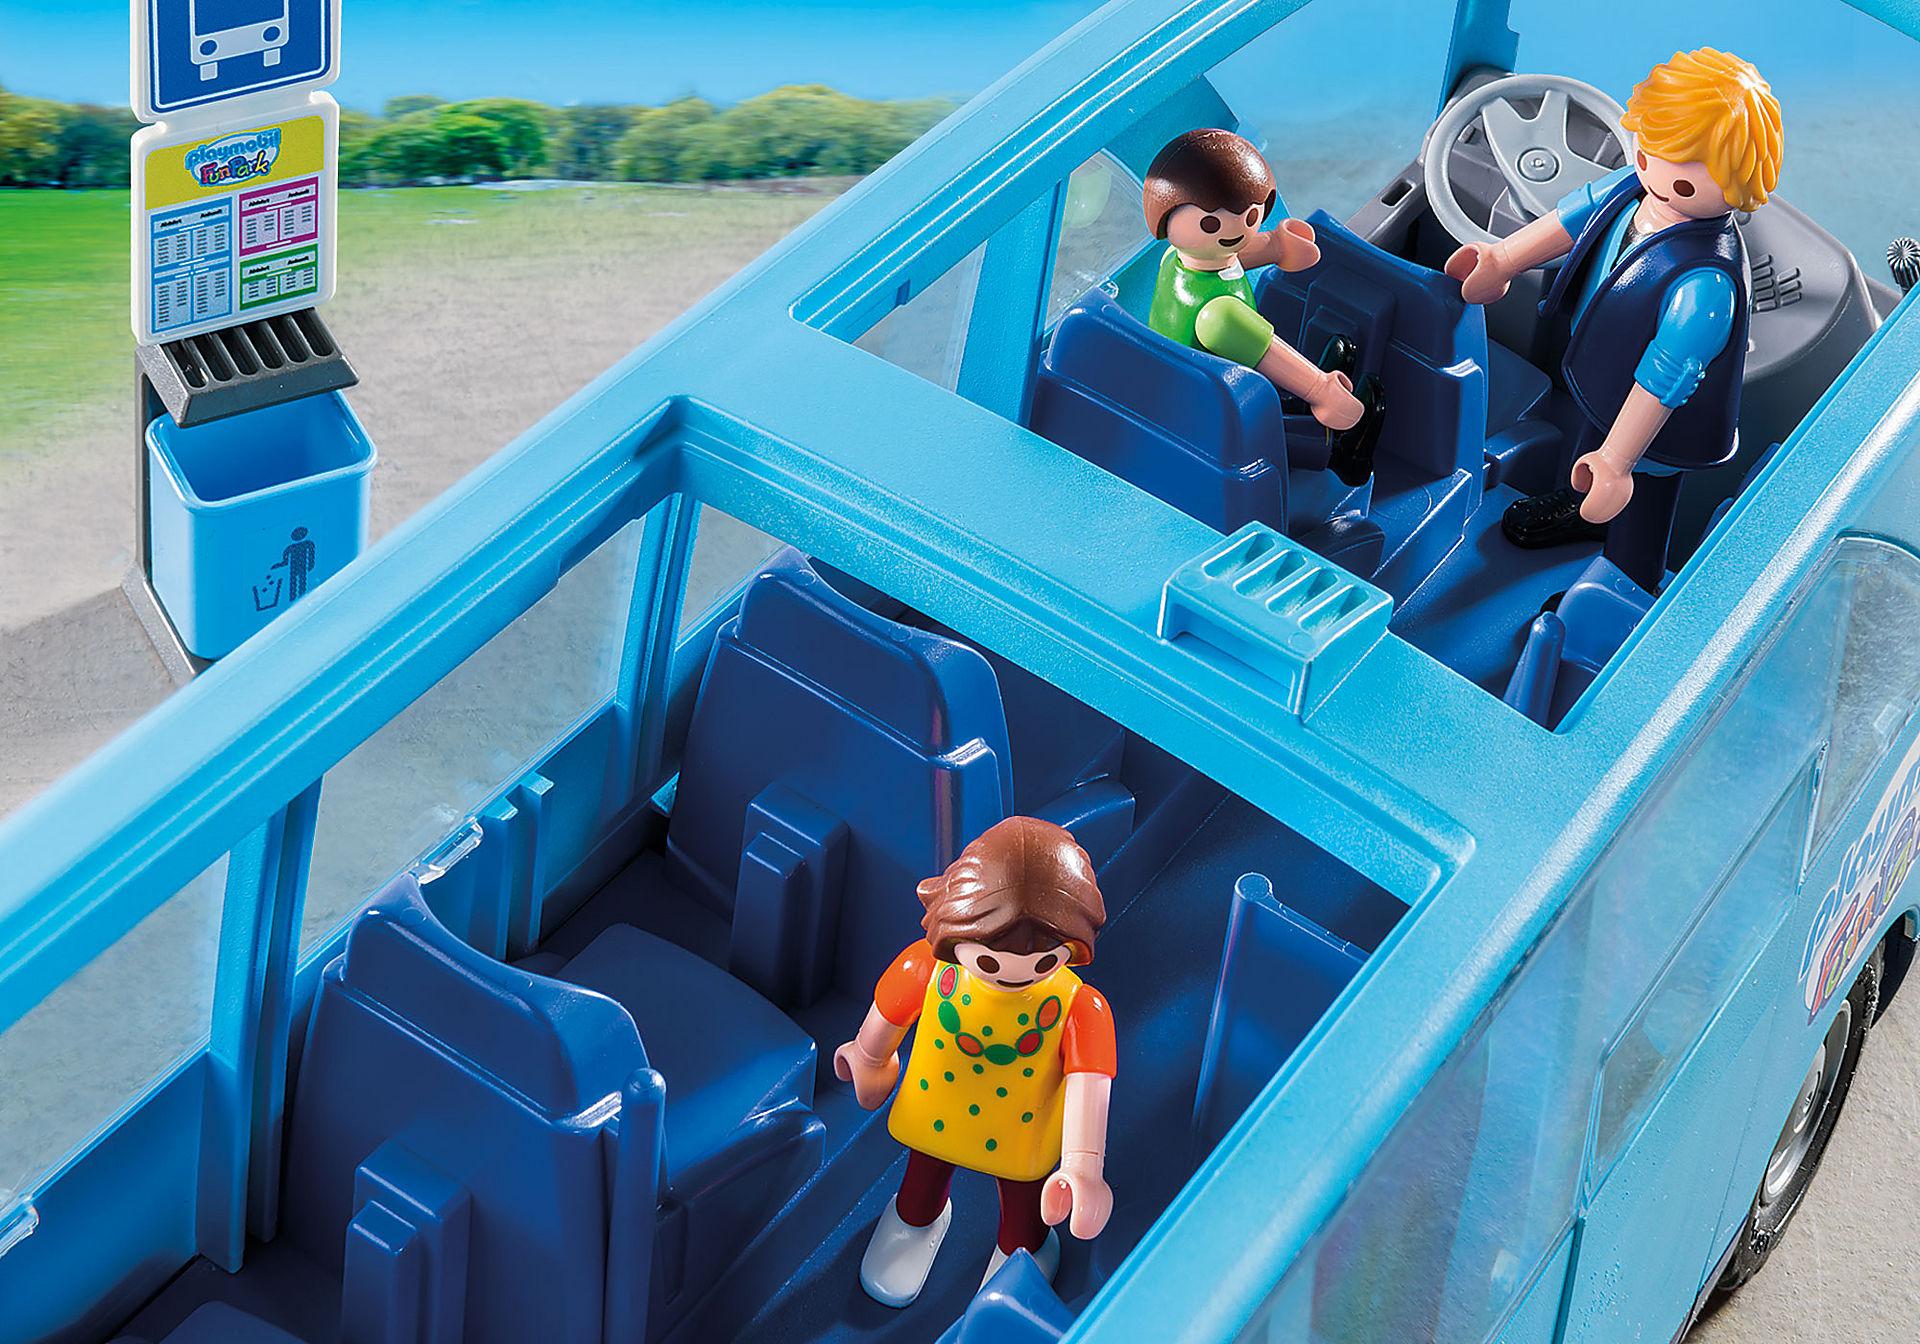 9117 Iskolabusz Fun Park zoom image5